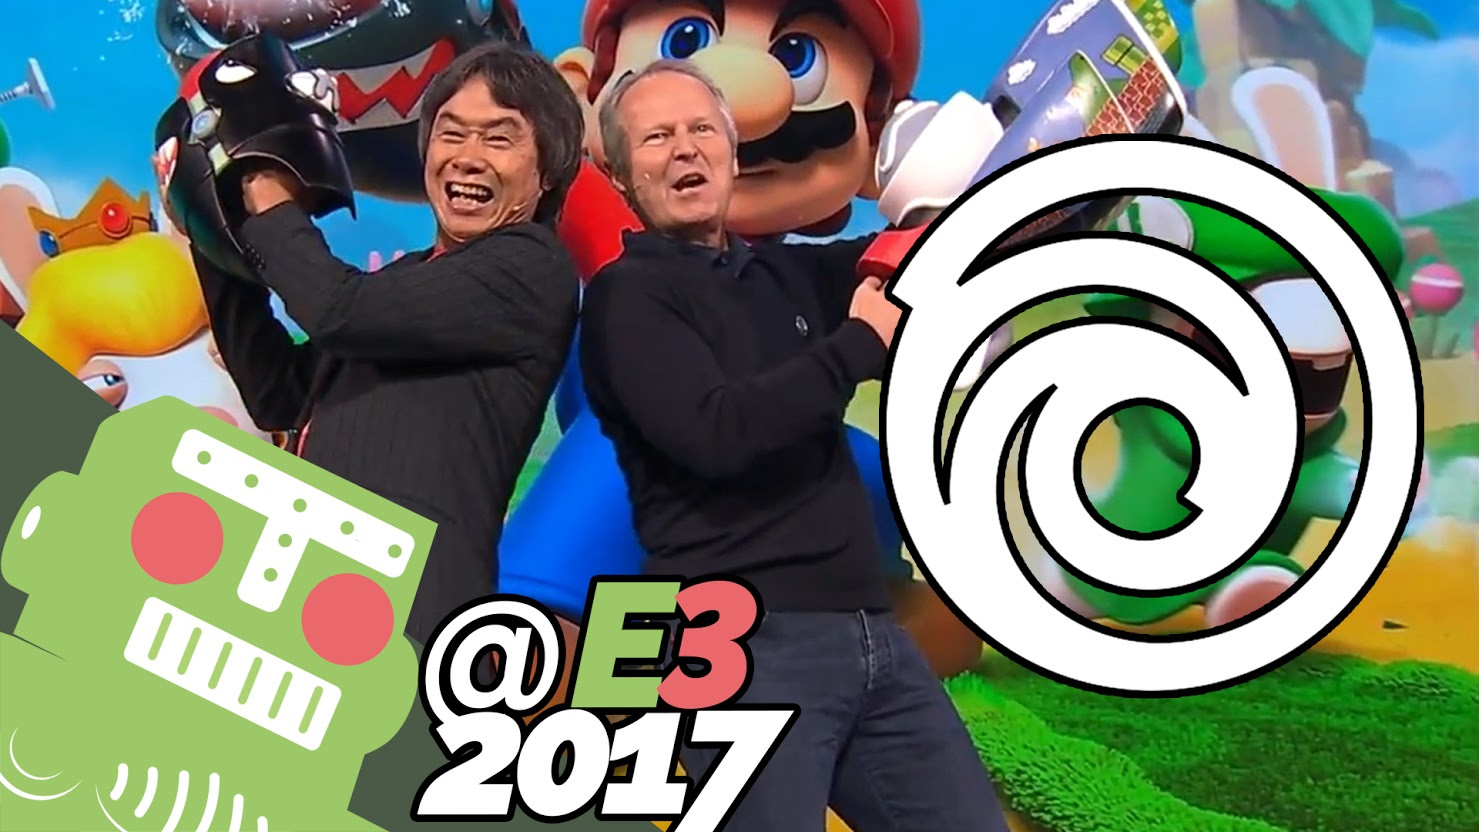 Grading Ubisoft's E3 2017 press conference screenshot